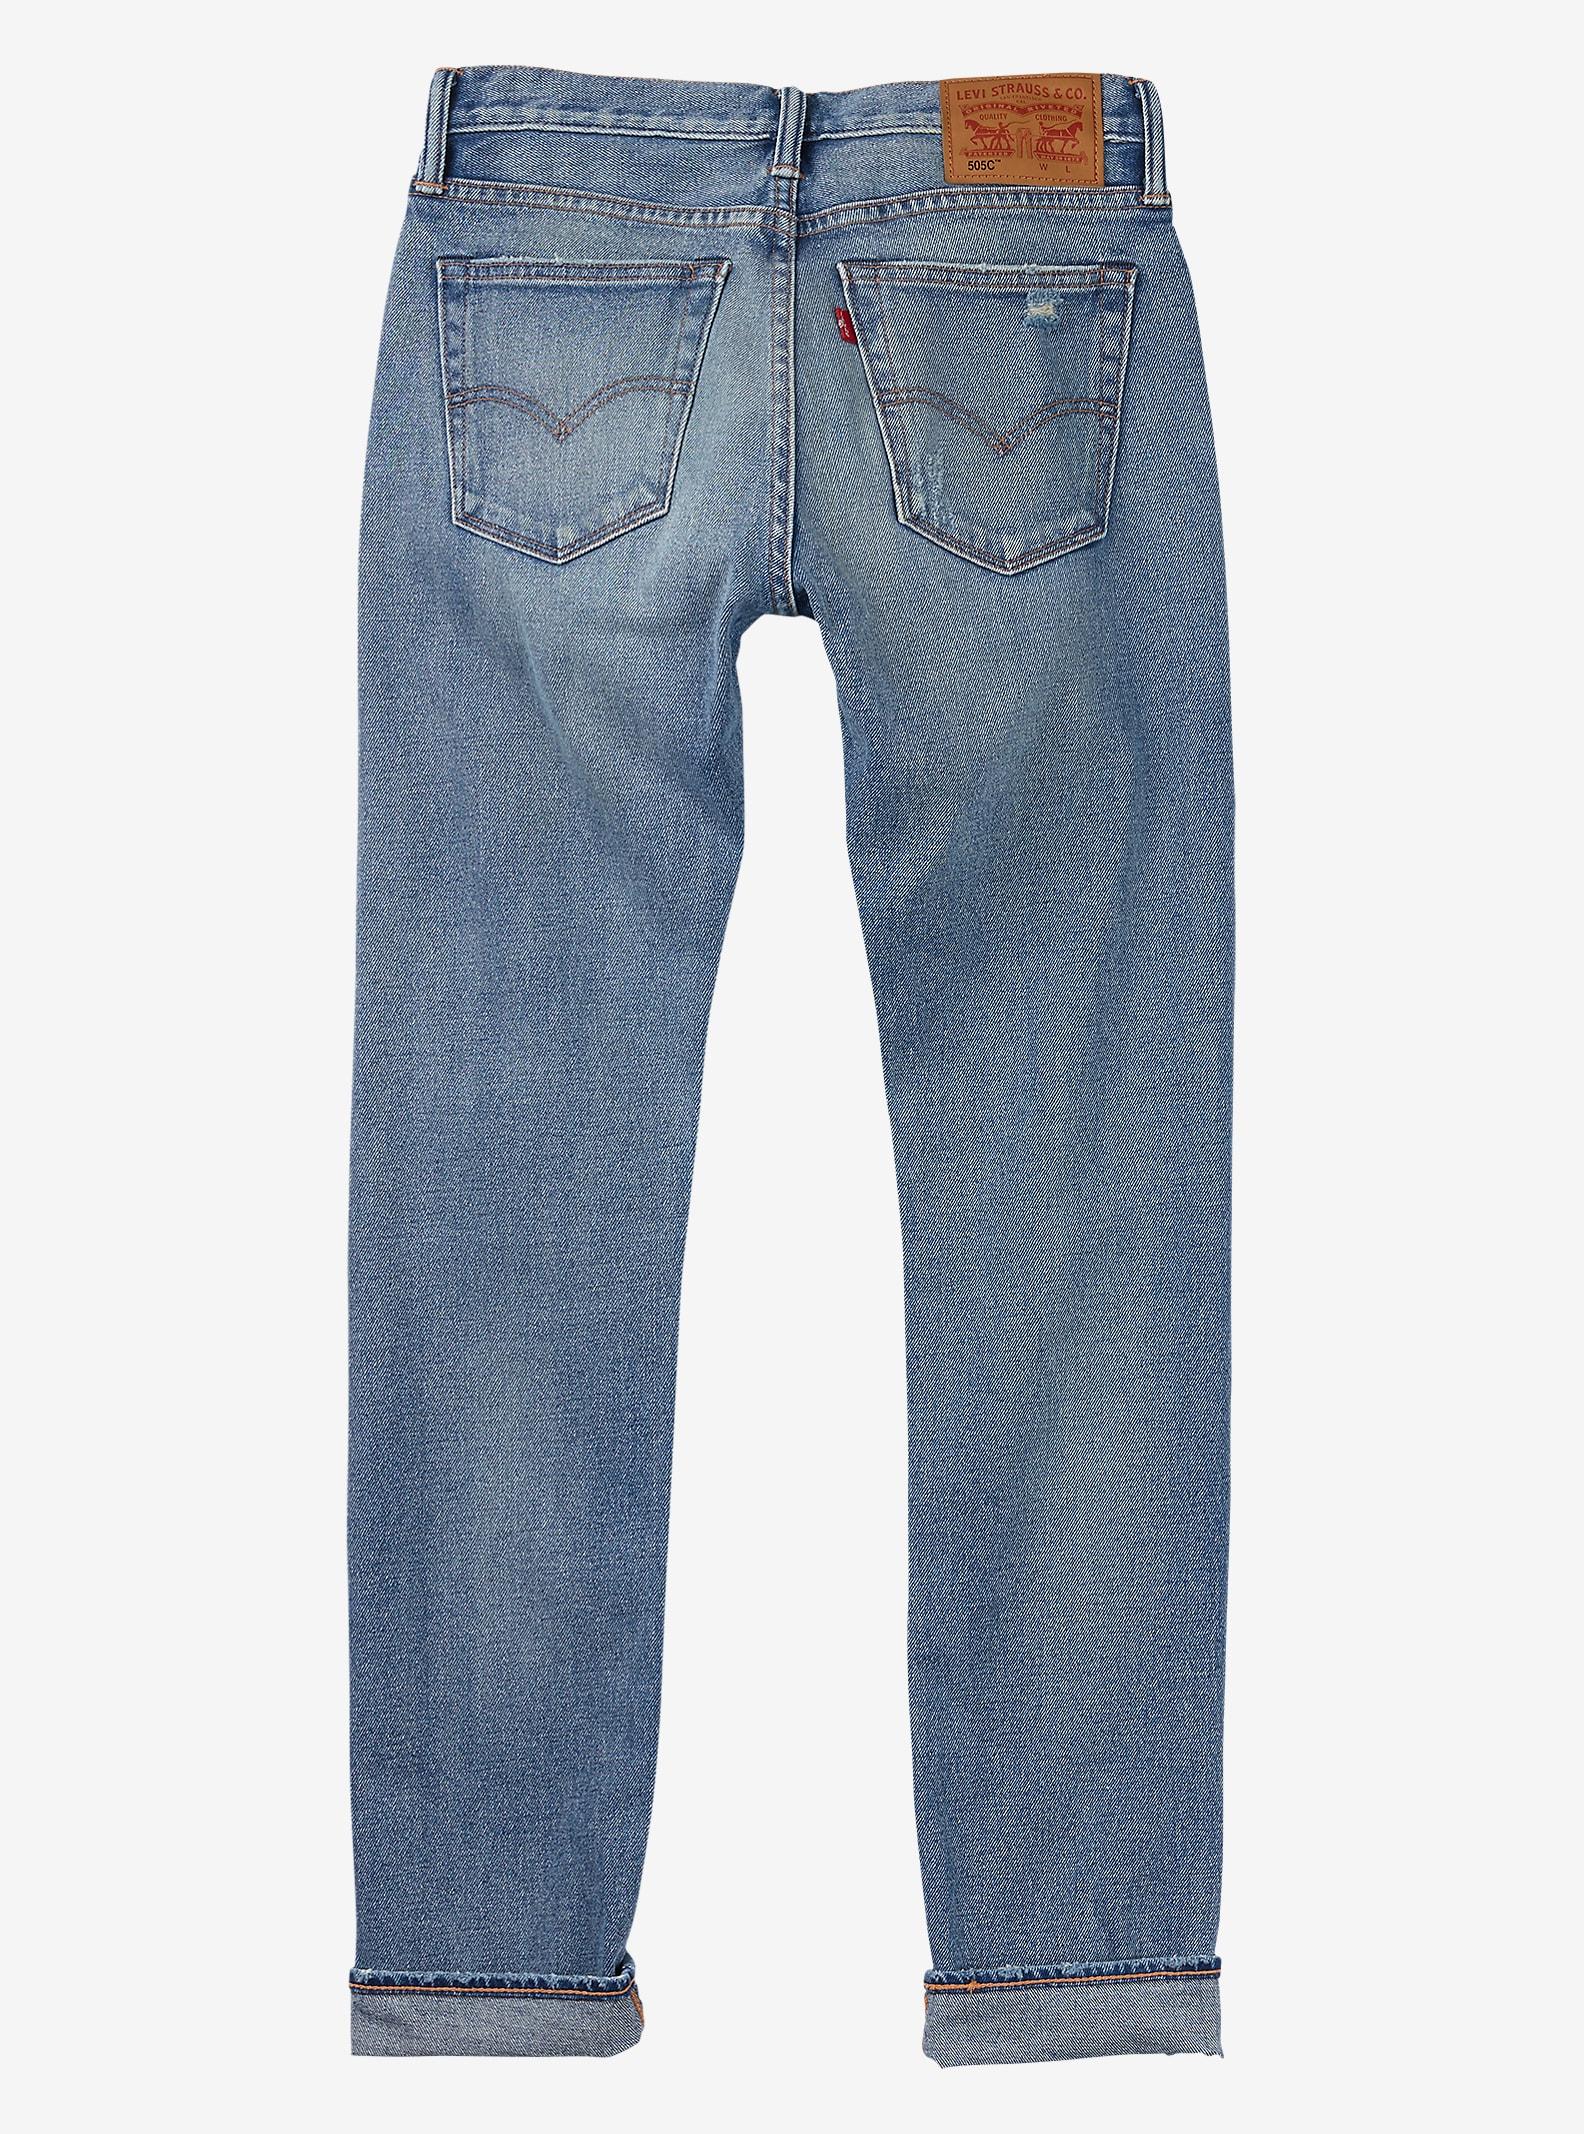 Women's Levi's® 505™C Jeans shown in Denim